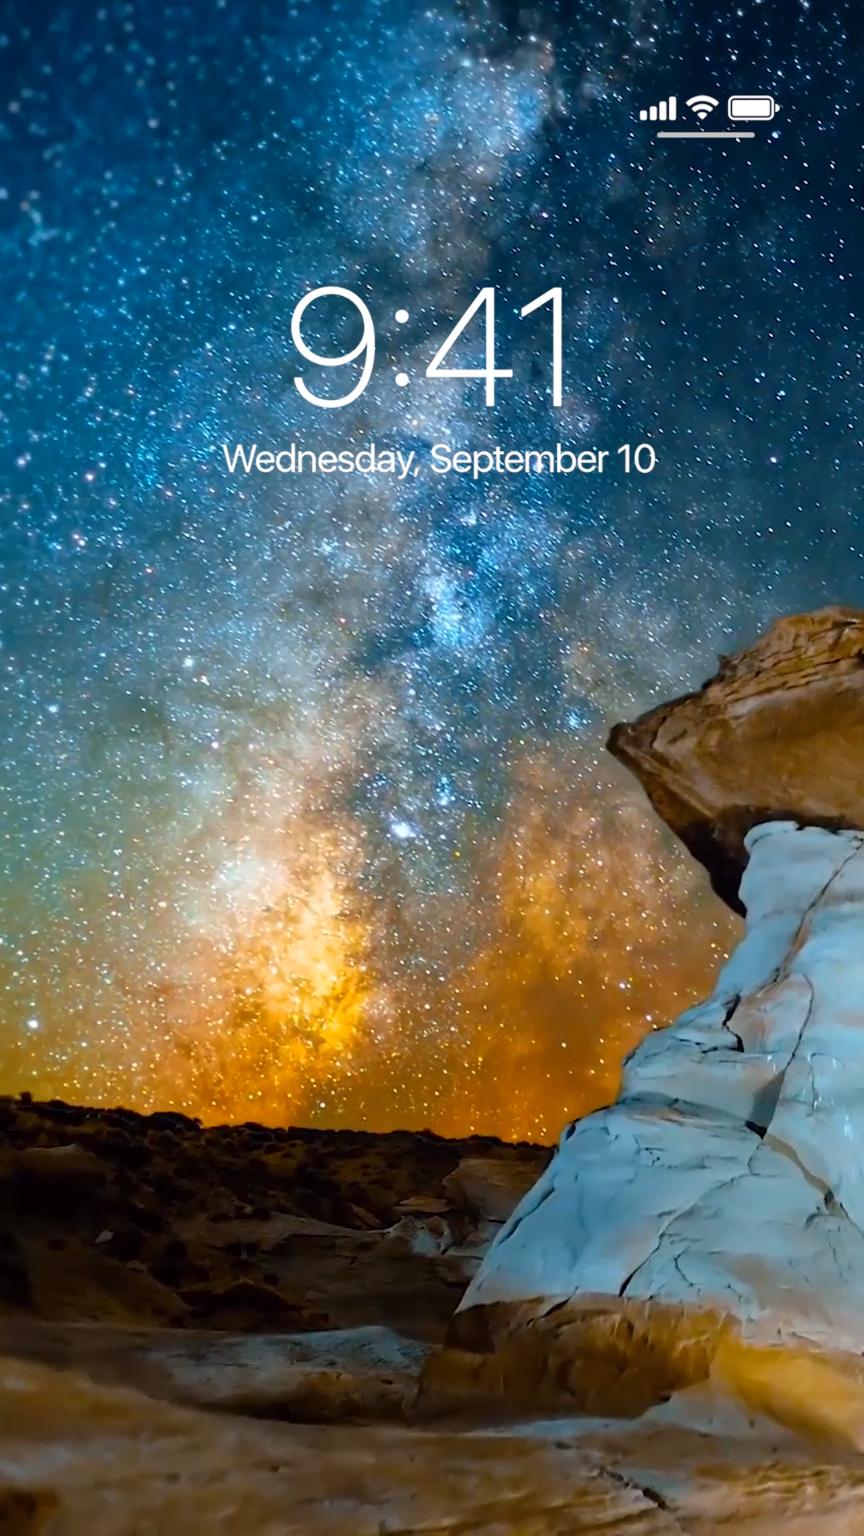 Iphone Live Wallpaper Cute - HD Wallpaper